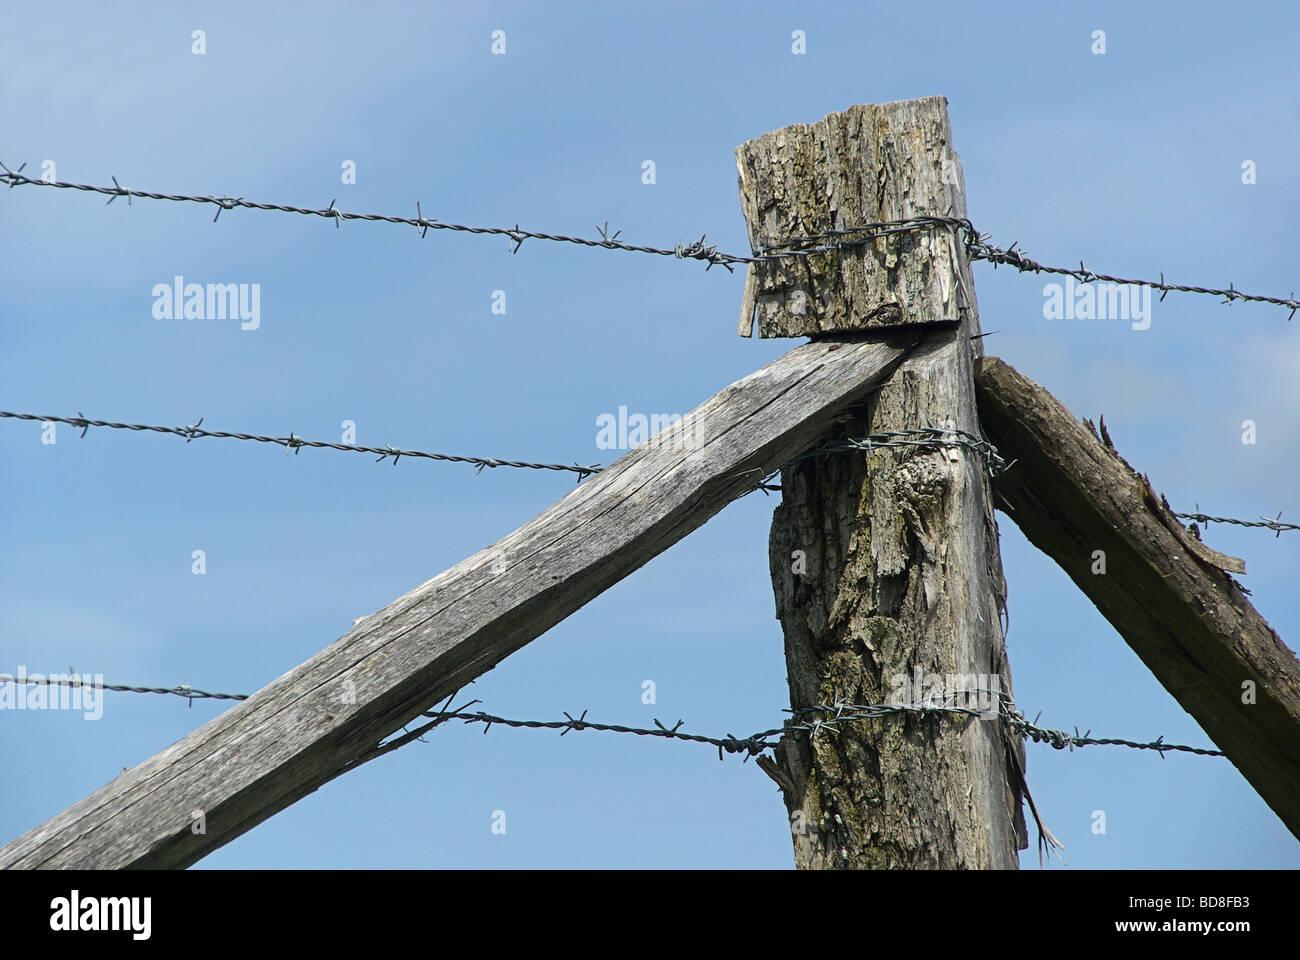 Steel Wire Rope Stockfotos & Steel Wire Rope Bilder - Alamy